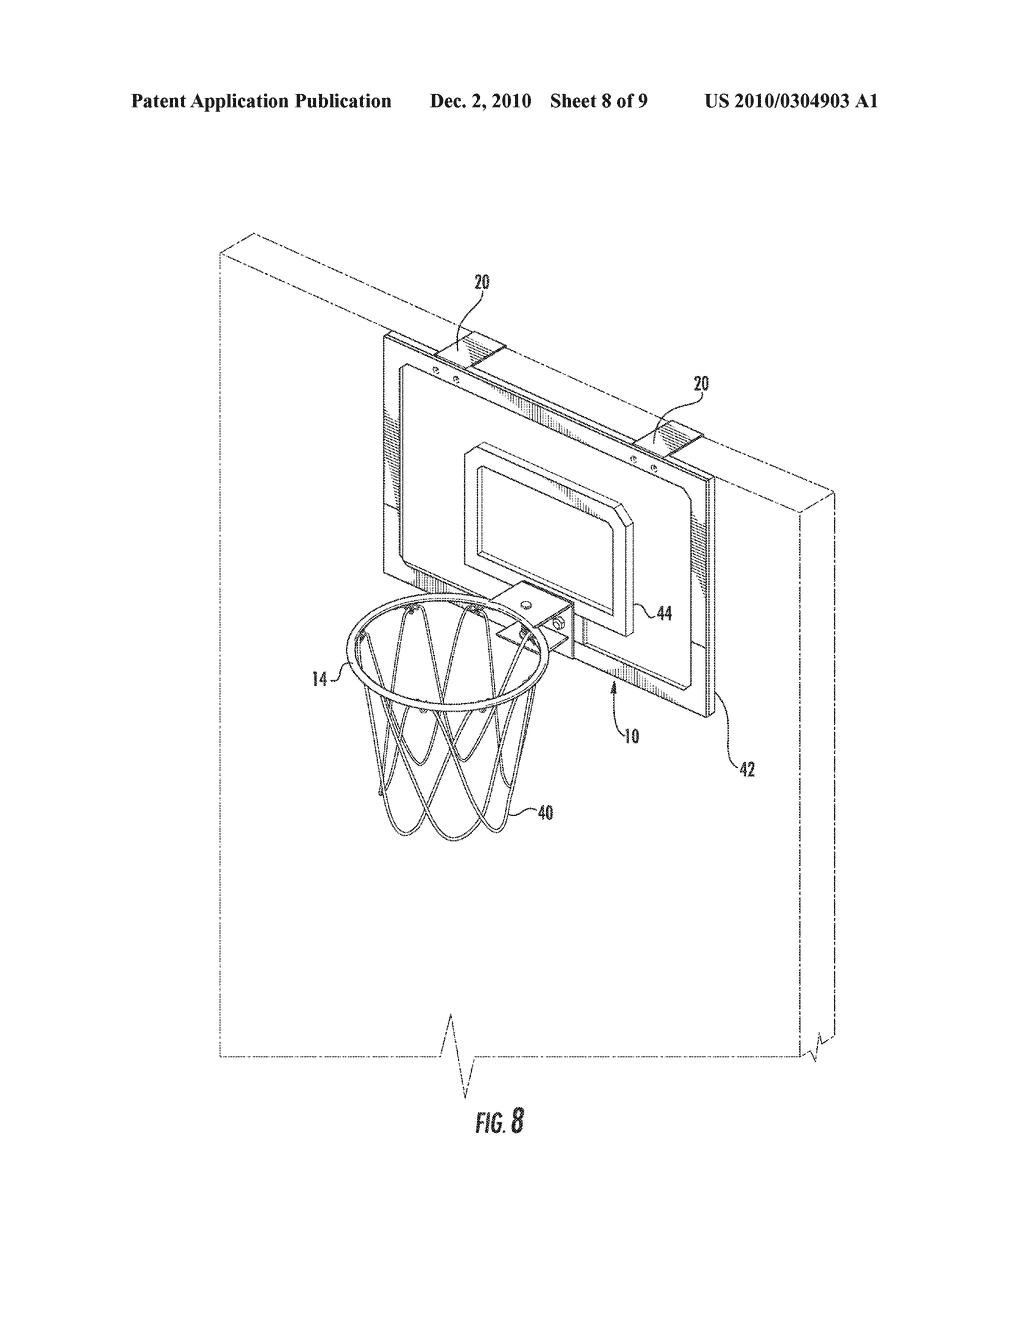 miniature door mounted basketball hoop diagram schematic and rh patentsencyclopedia com  spalding basketball hoop diagram